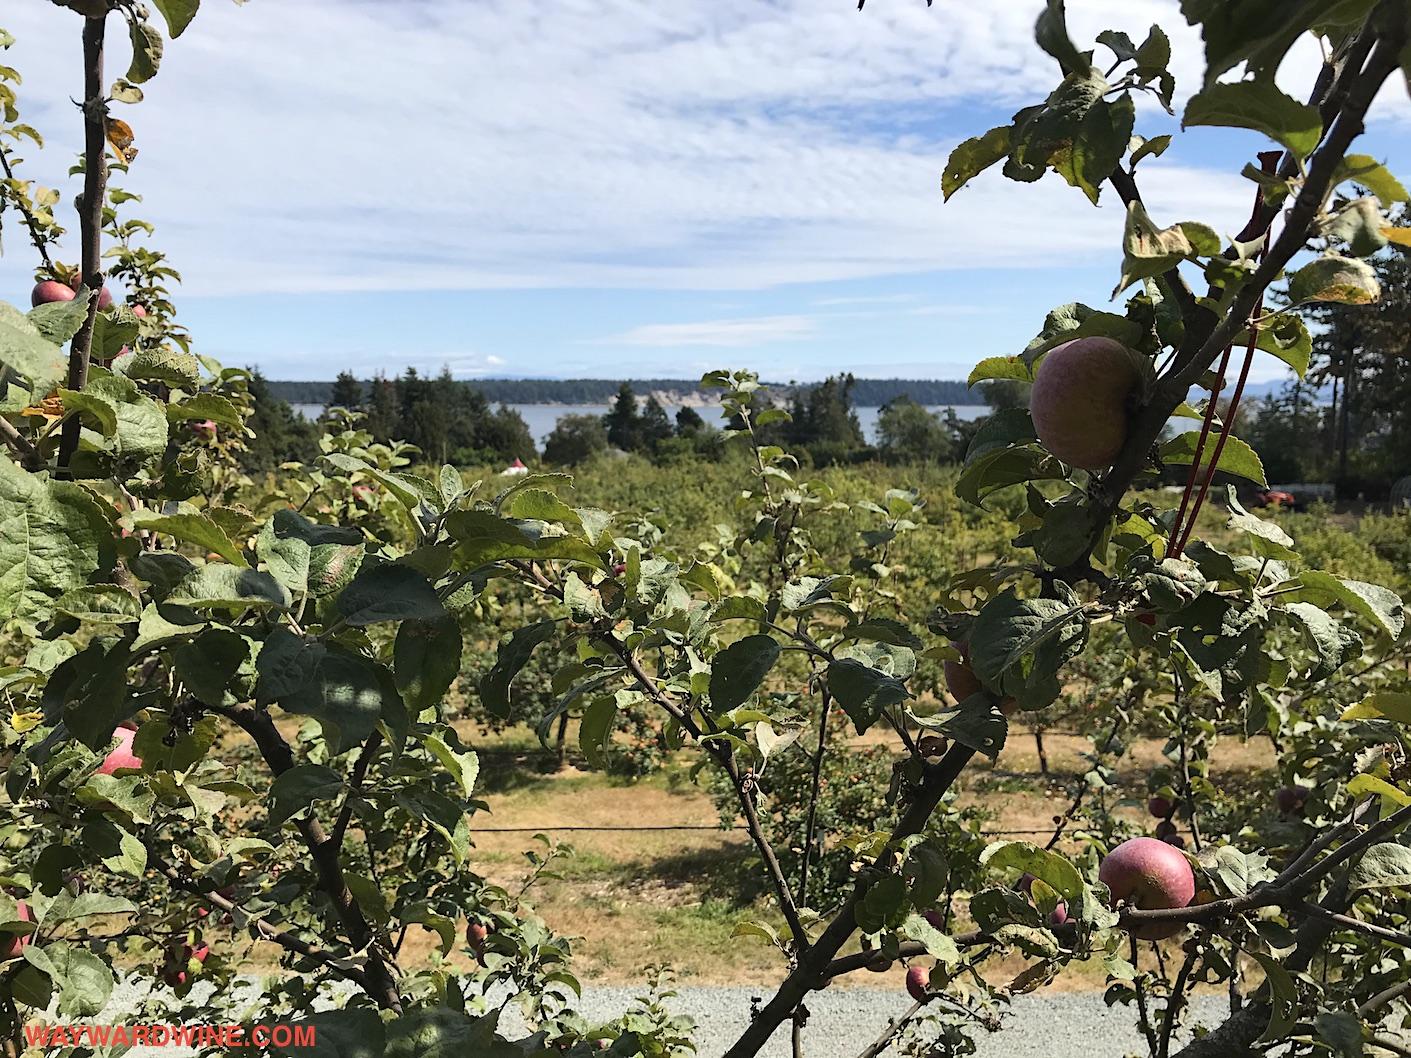 Apples Sea Cider View